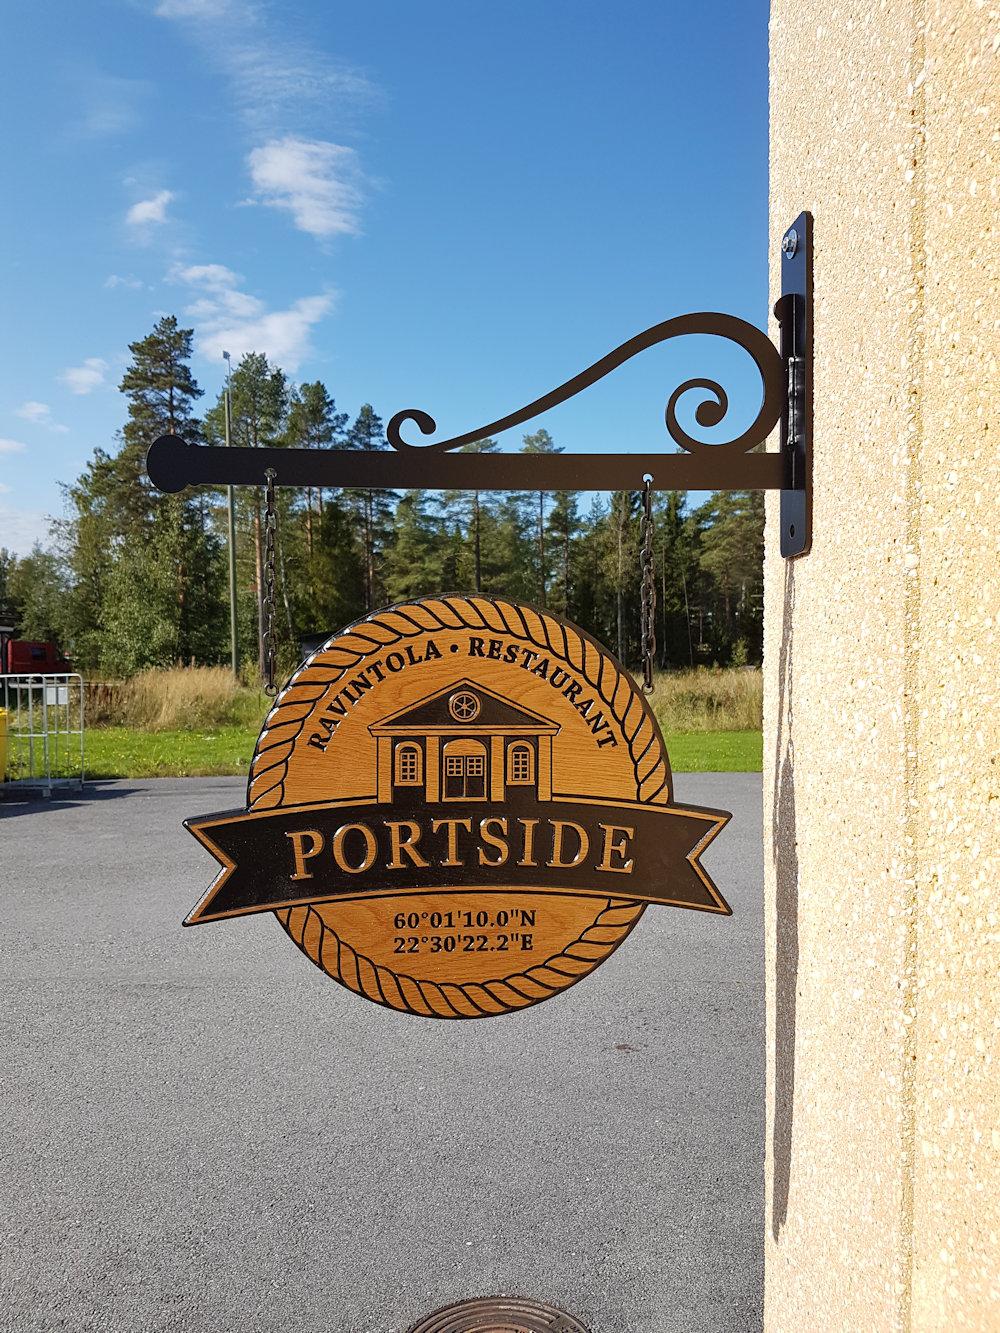 Portside Helsinki